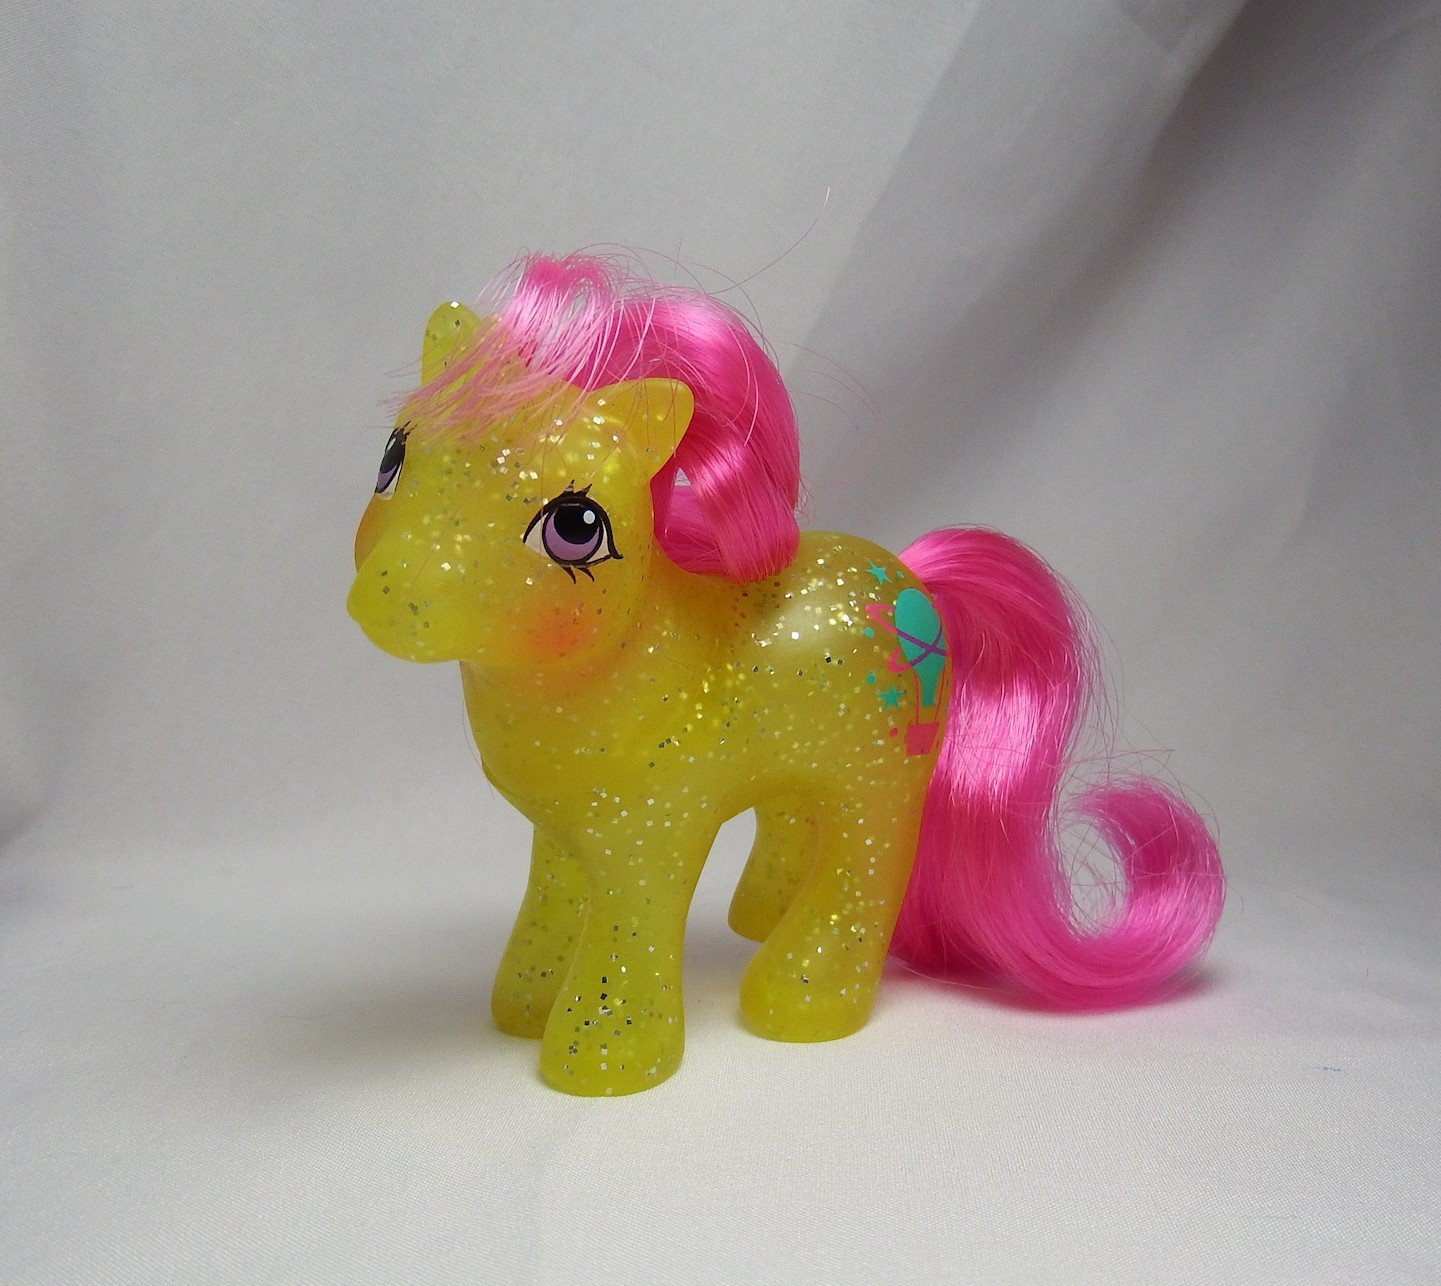 Vintage G1 My Little Pony Sparkle Baby Gusty